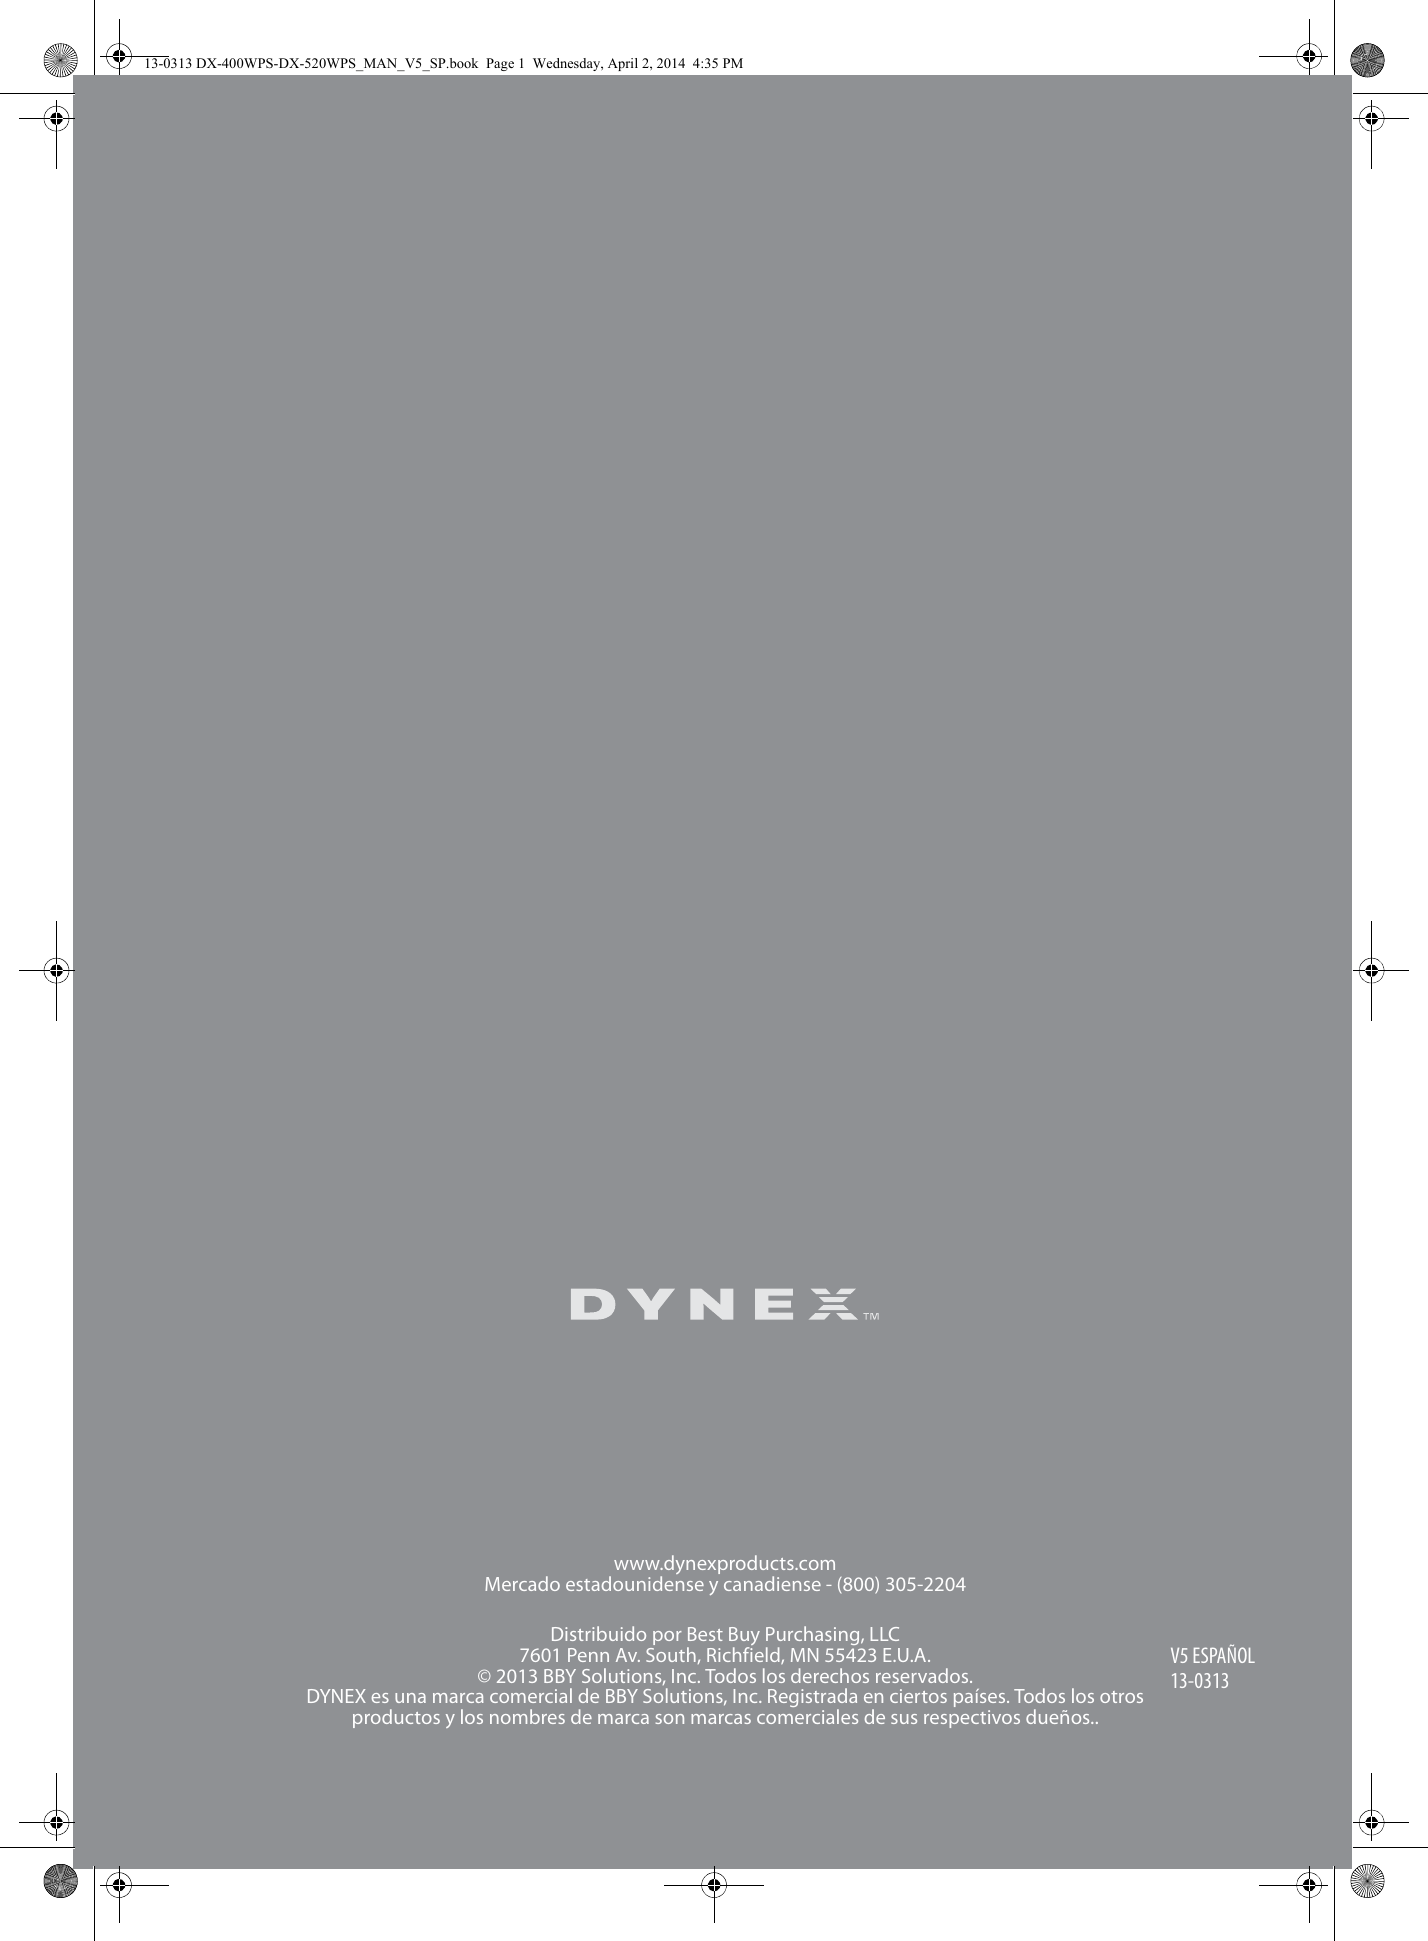 dynex 400 watt atx cpu power supply white users manual 13 0313 dx rh usermanual wiki Clip Art User Guide Example User Guide